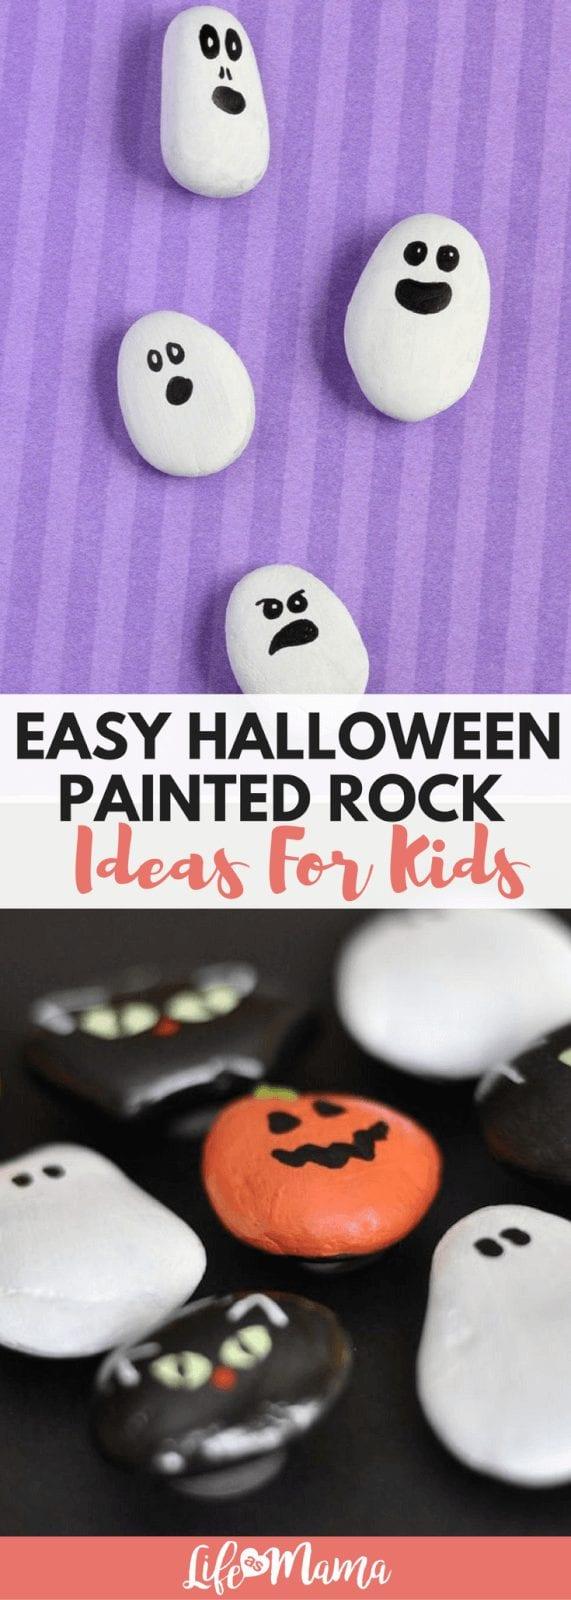 halloween painted rock